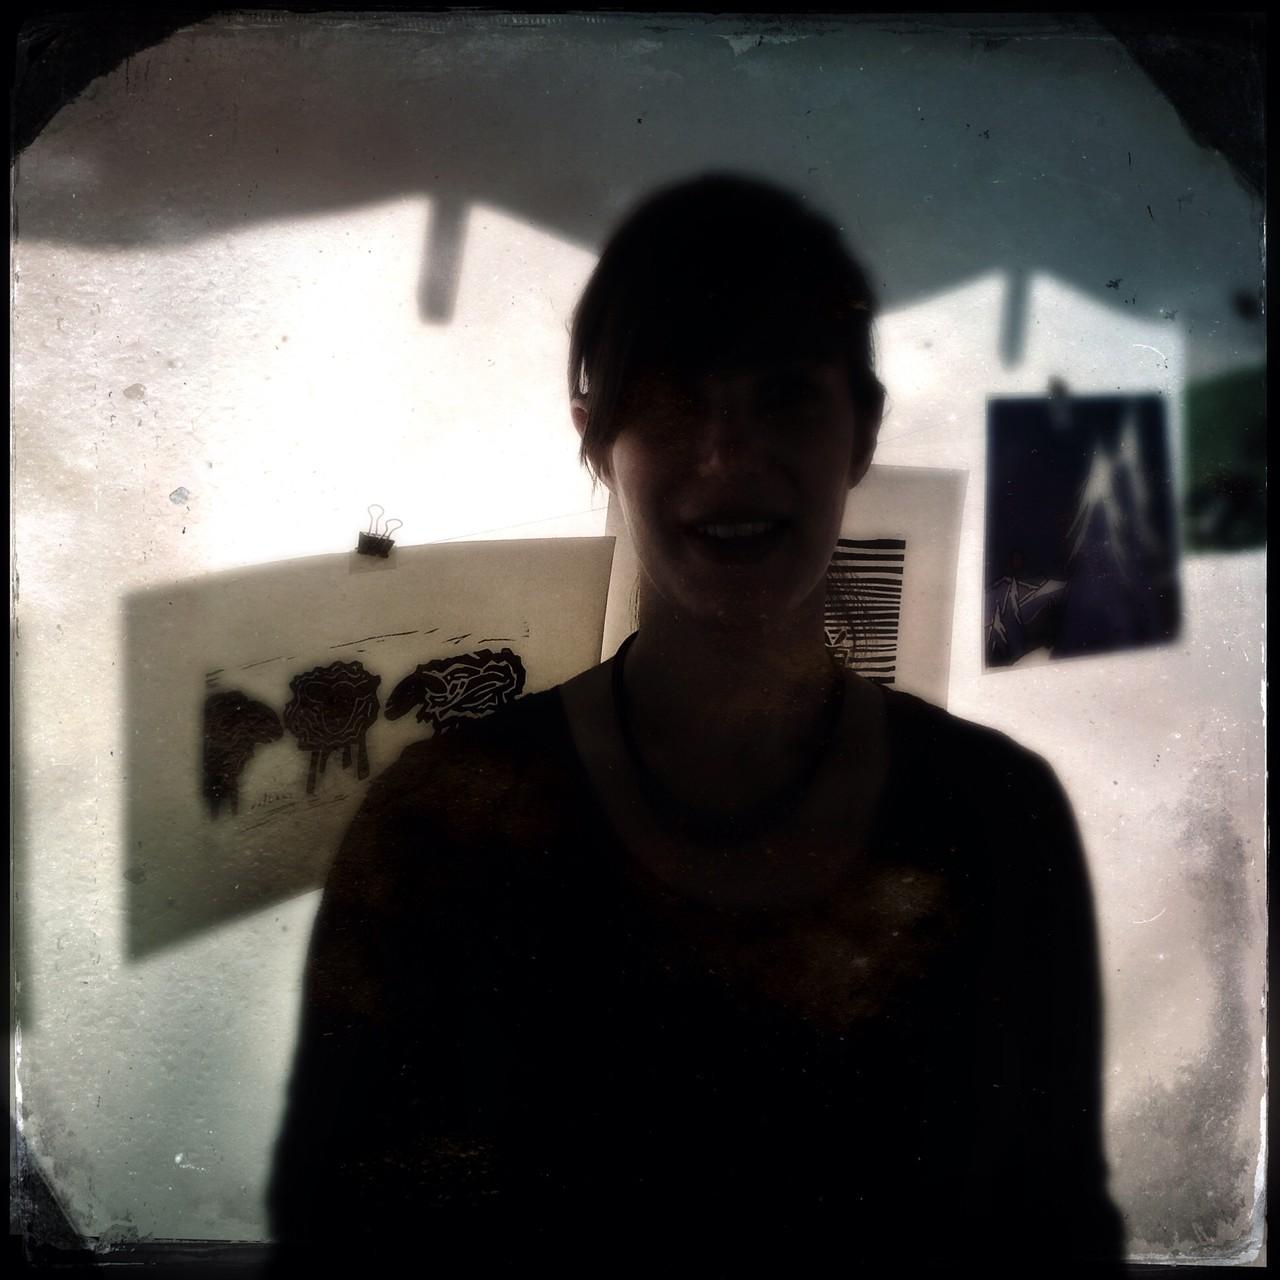 Ingrid Sissung